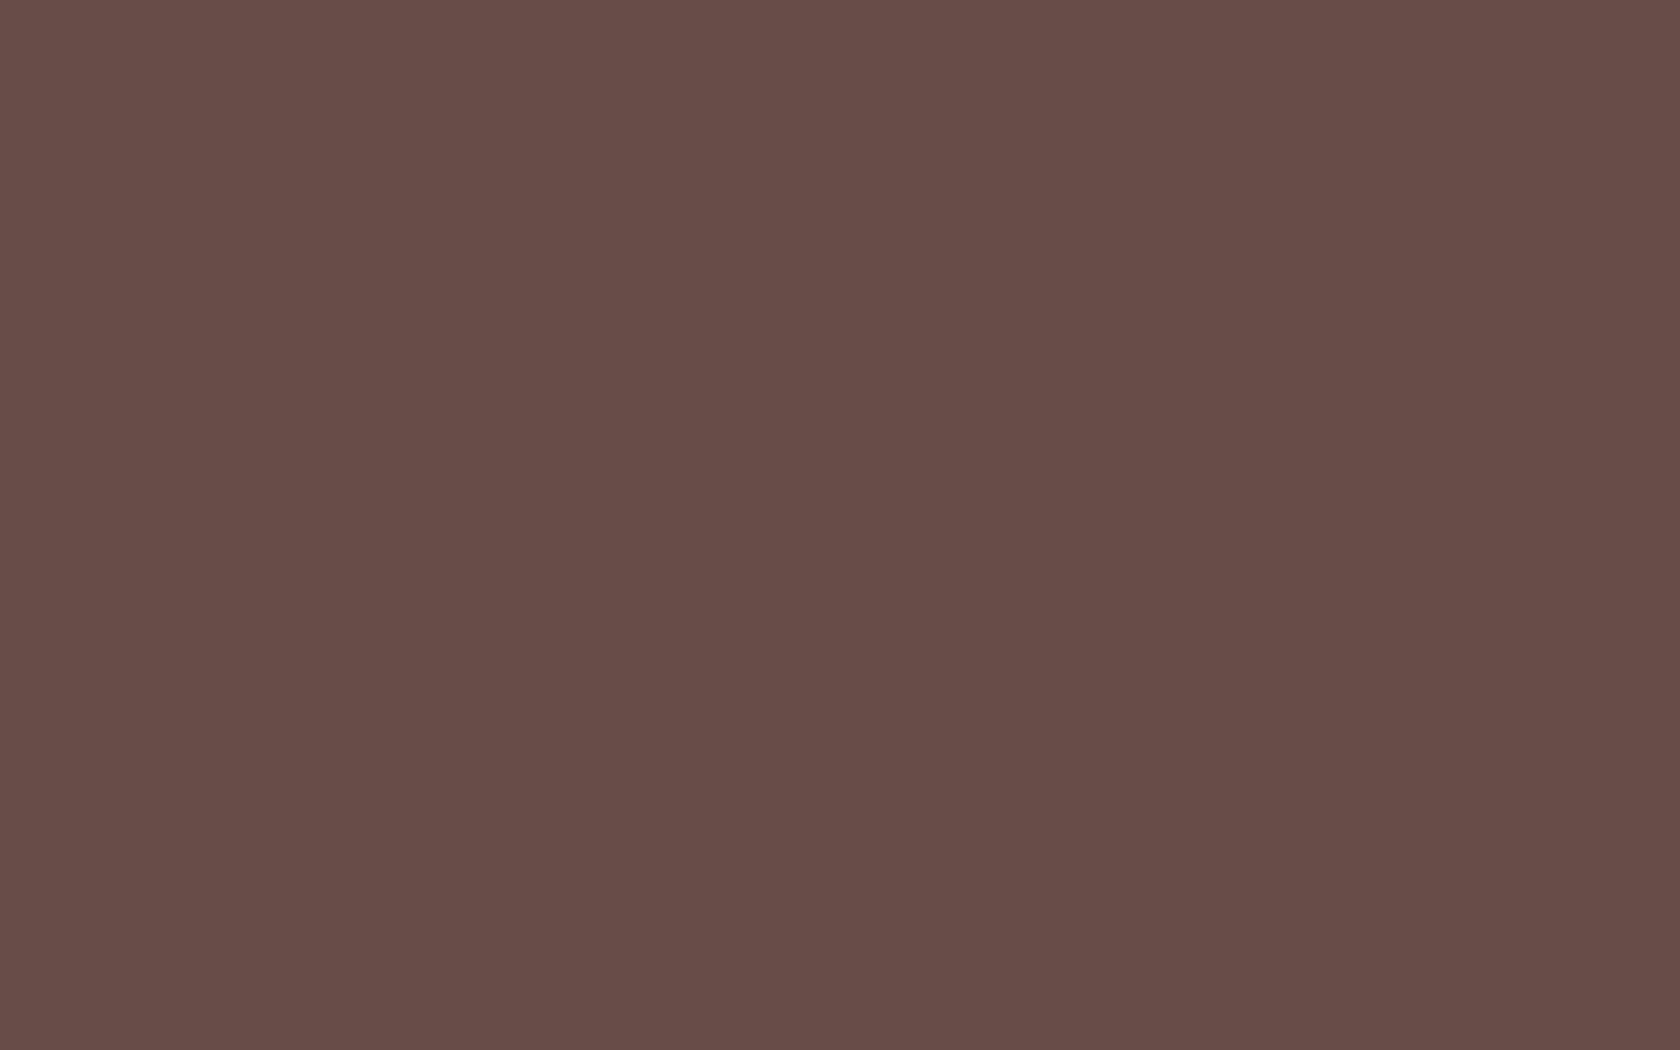 1680x1050 Liver Solid Color Background